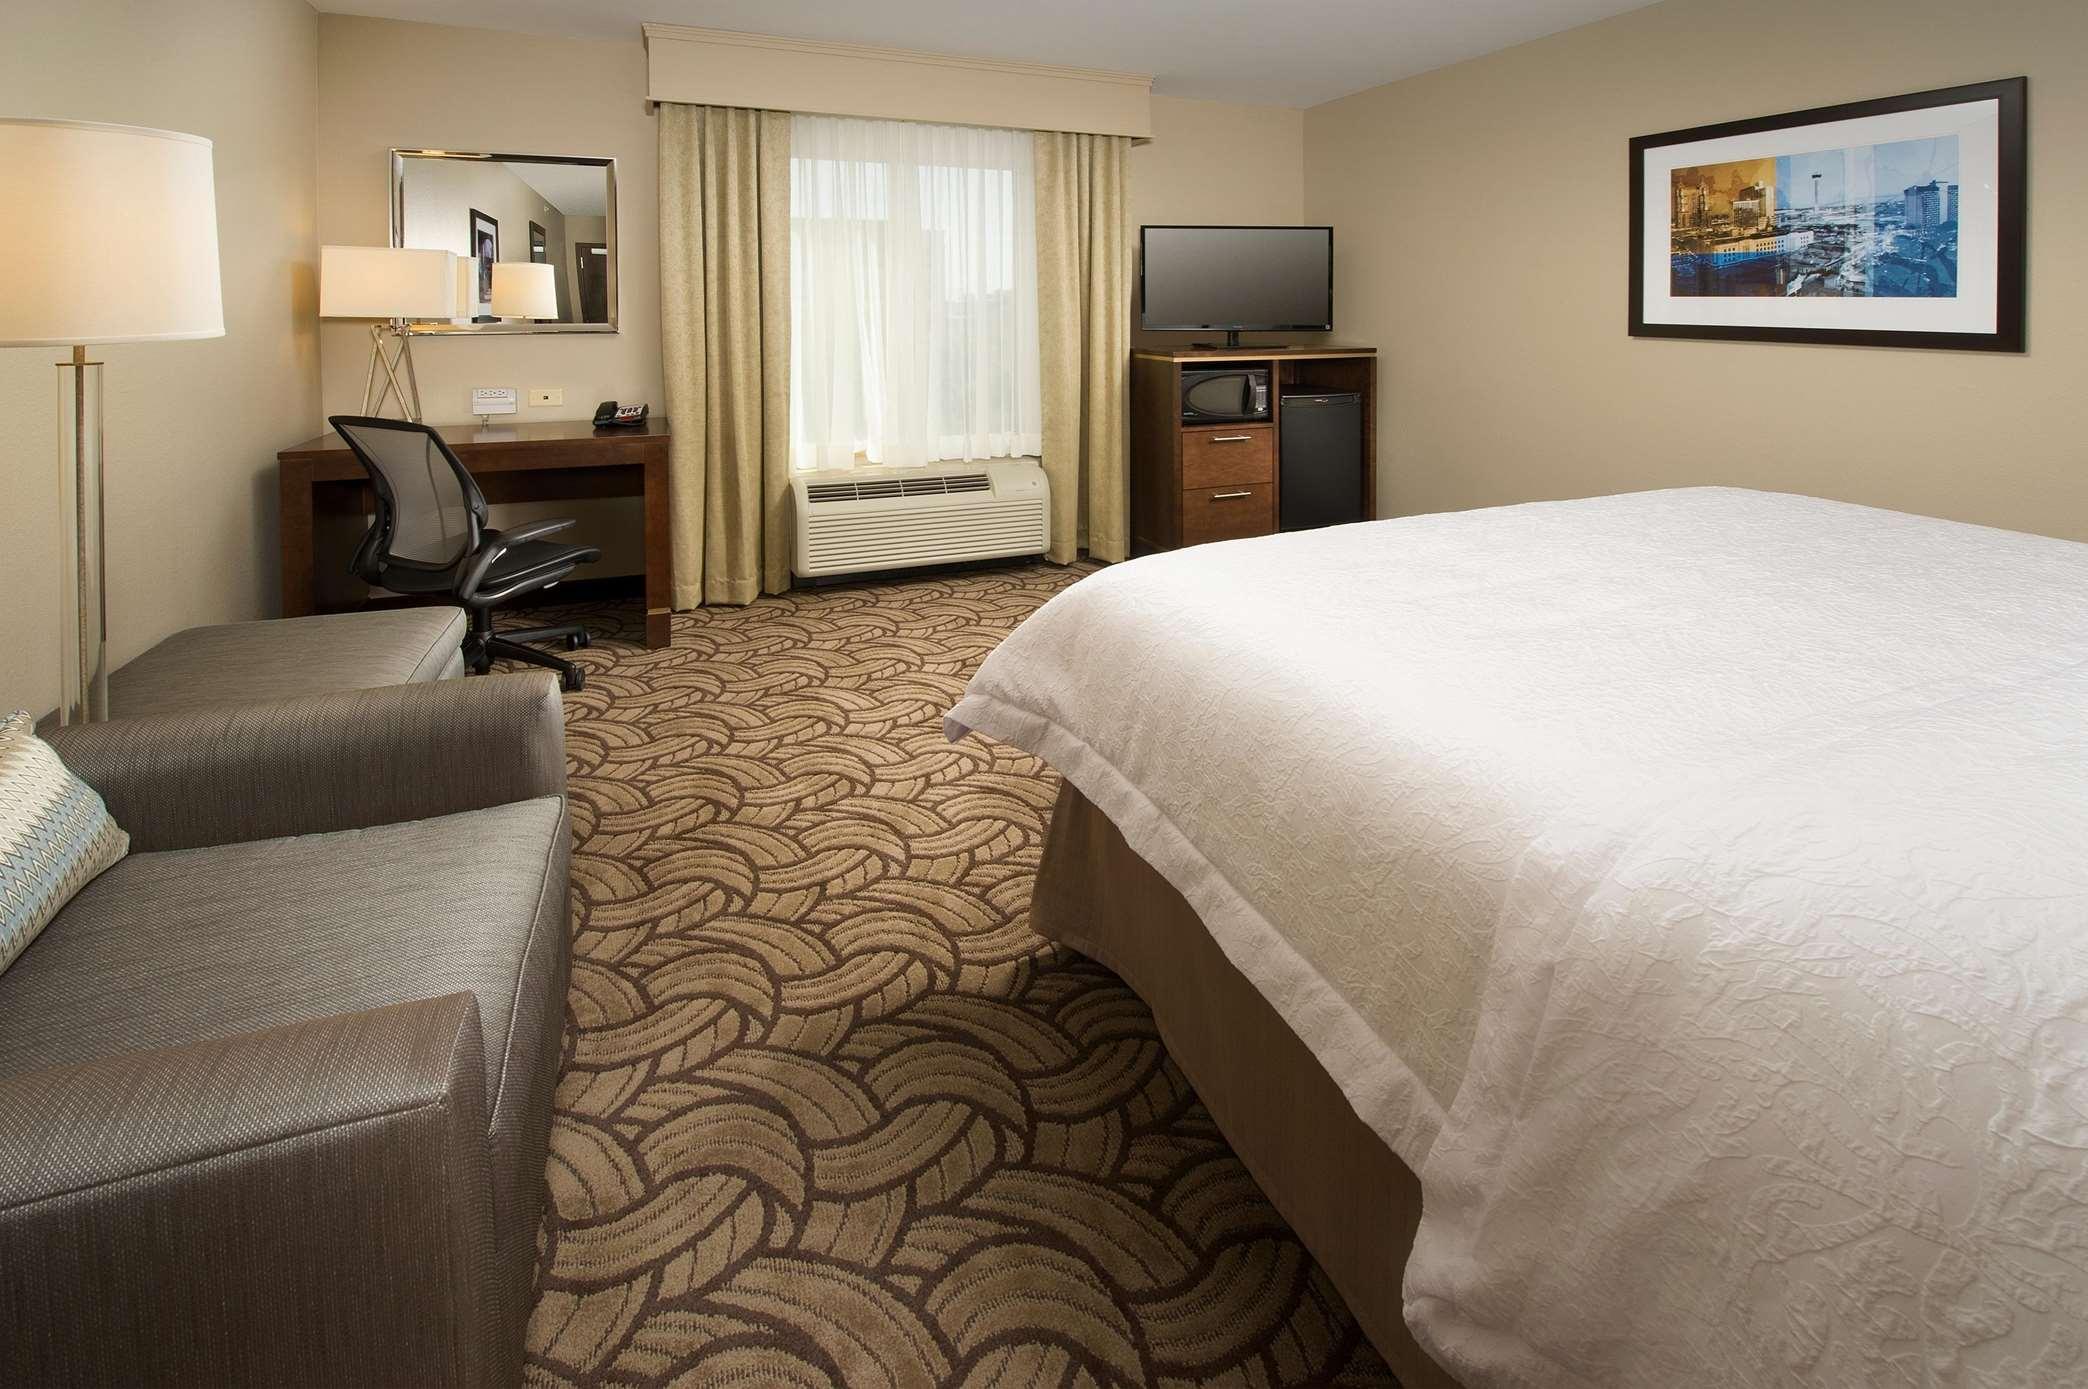 Hampton Inn & Suites San Antonio-Downtown/Market Square image 9